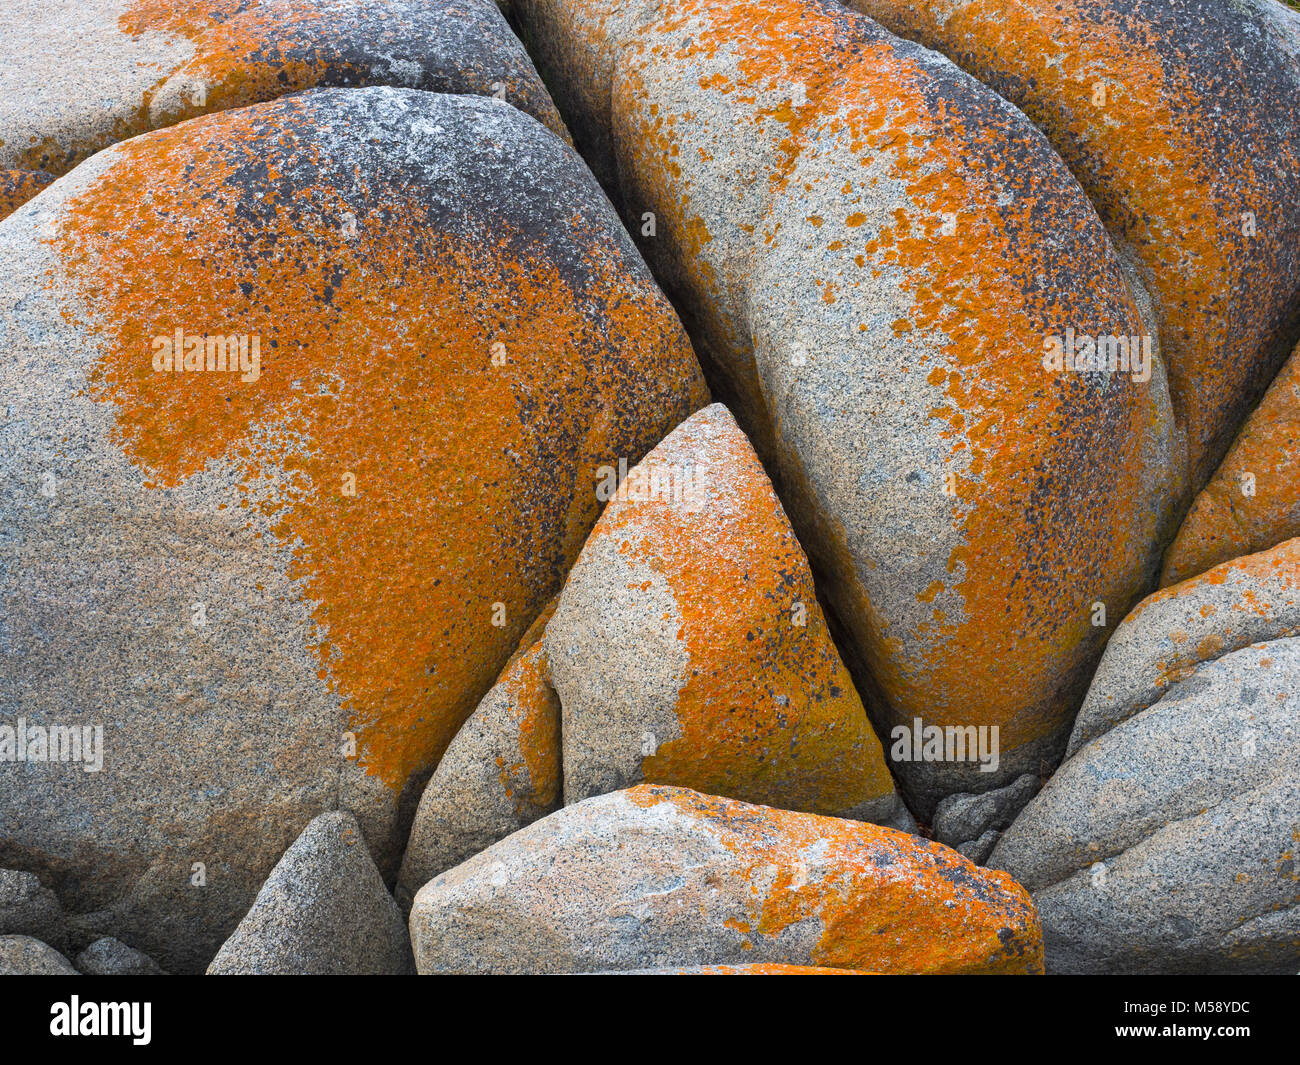 Hazards beach in Freycinet National Park, Tasmania, Australia - Stock Image